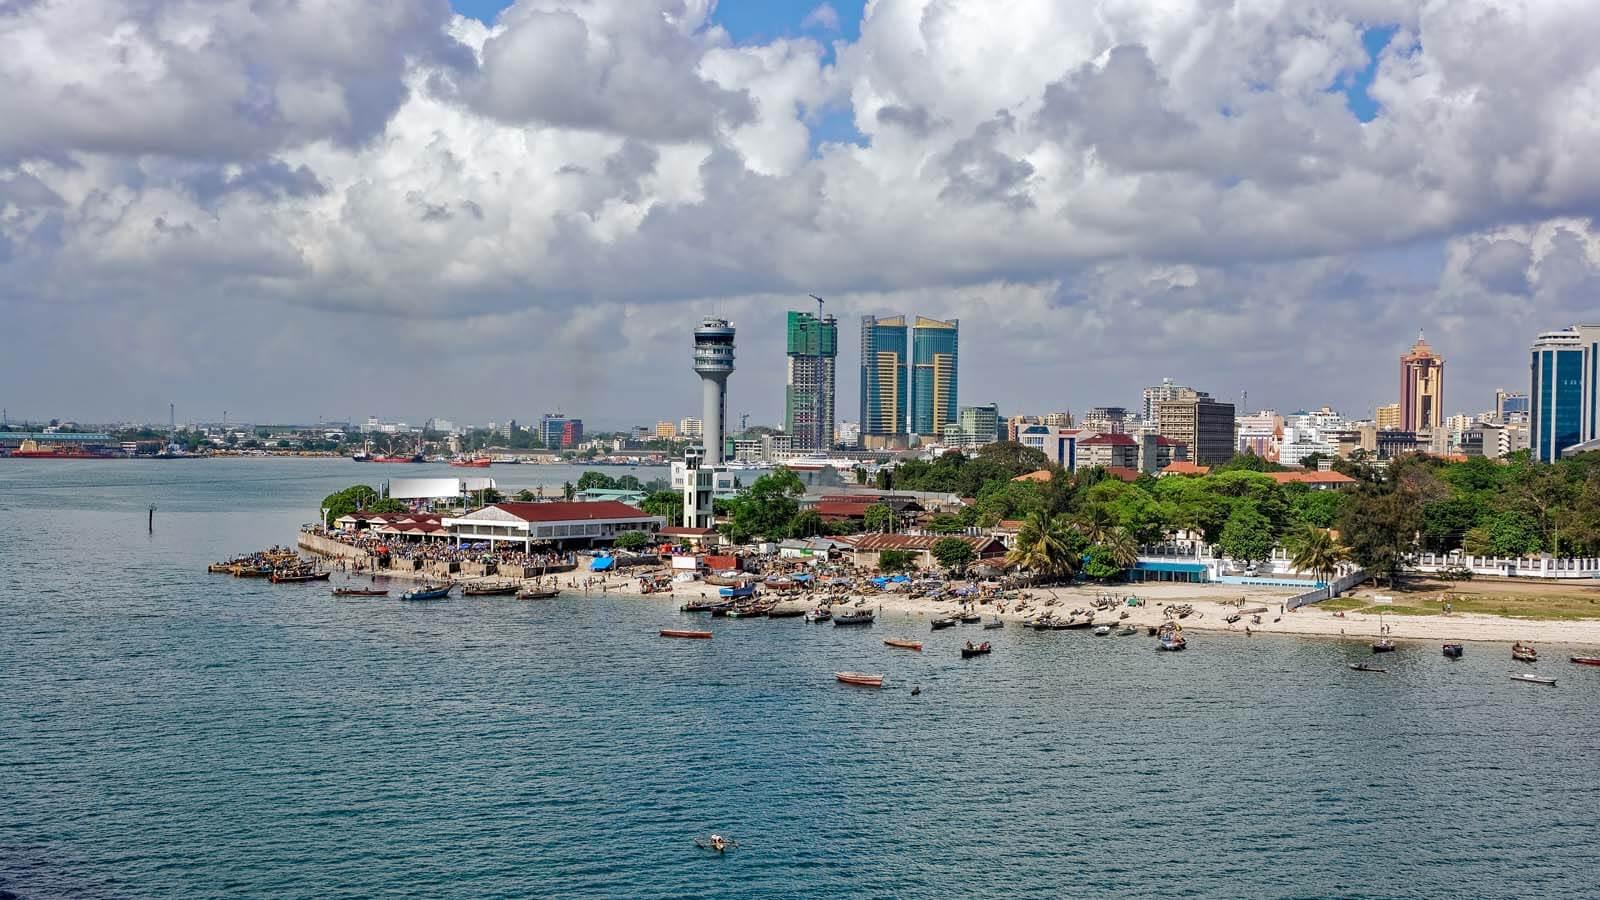 tanzania cities arusha and dar es salaam with tanzania odyssey